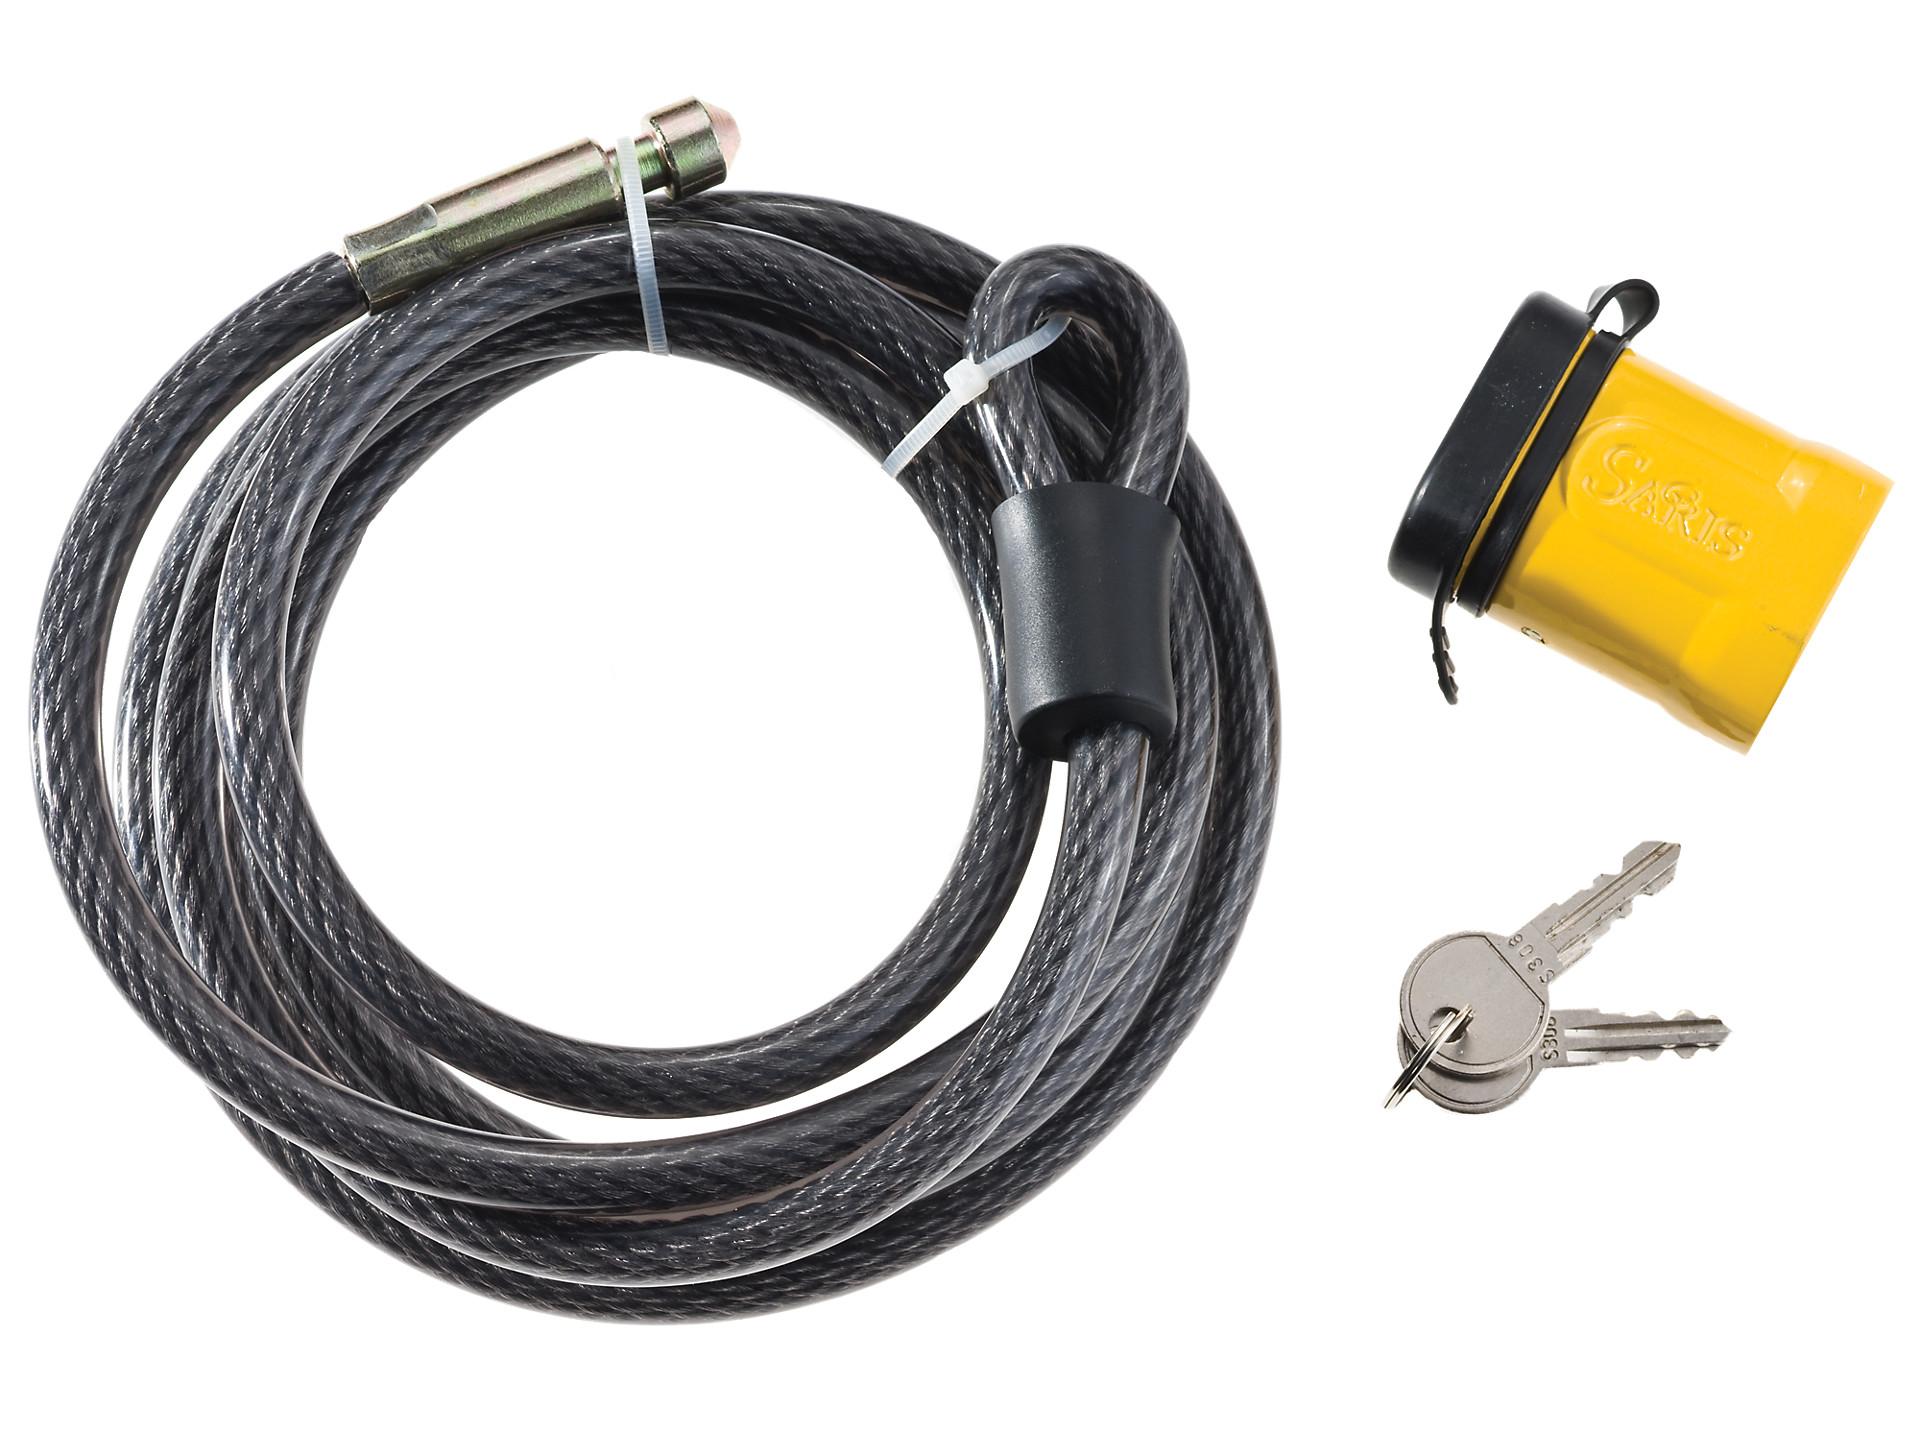 Saris Locking 8-Foot Cable